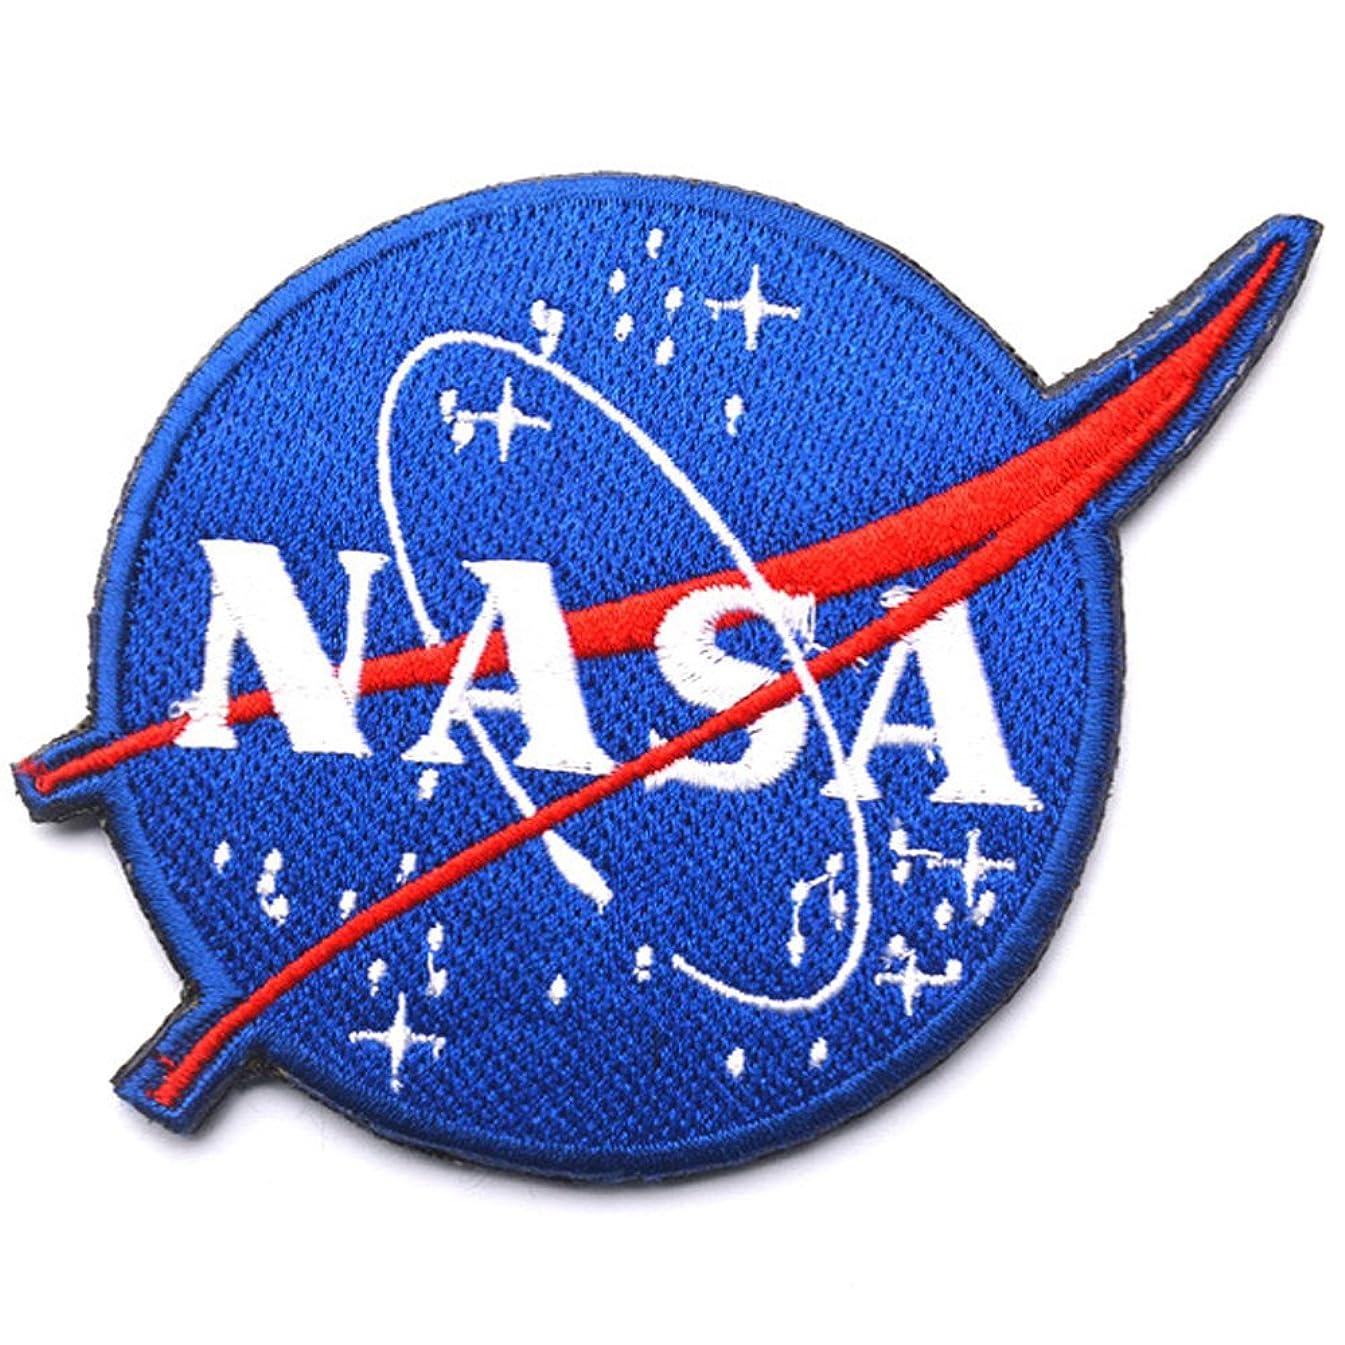 Nasa Space Program Patches